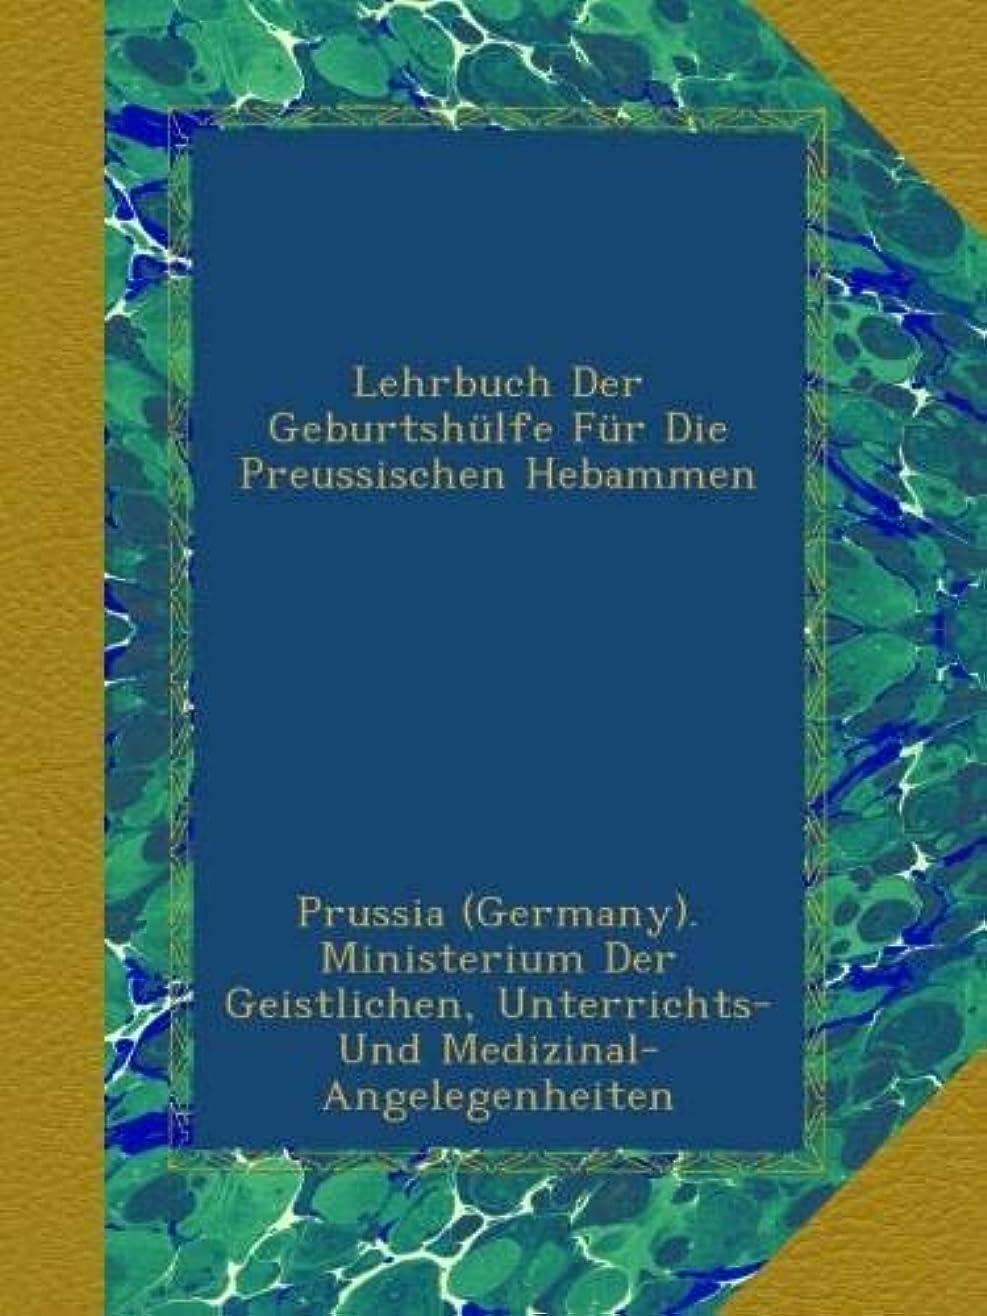 真面目なクール不可能なLehrbuch Der Geburtshuelfe Fuer Die Preussischen Hebammen